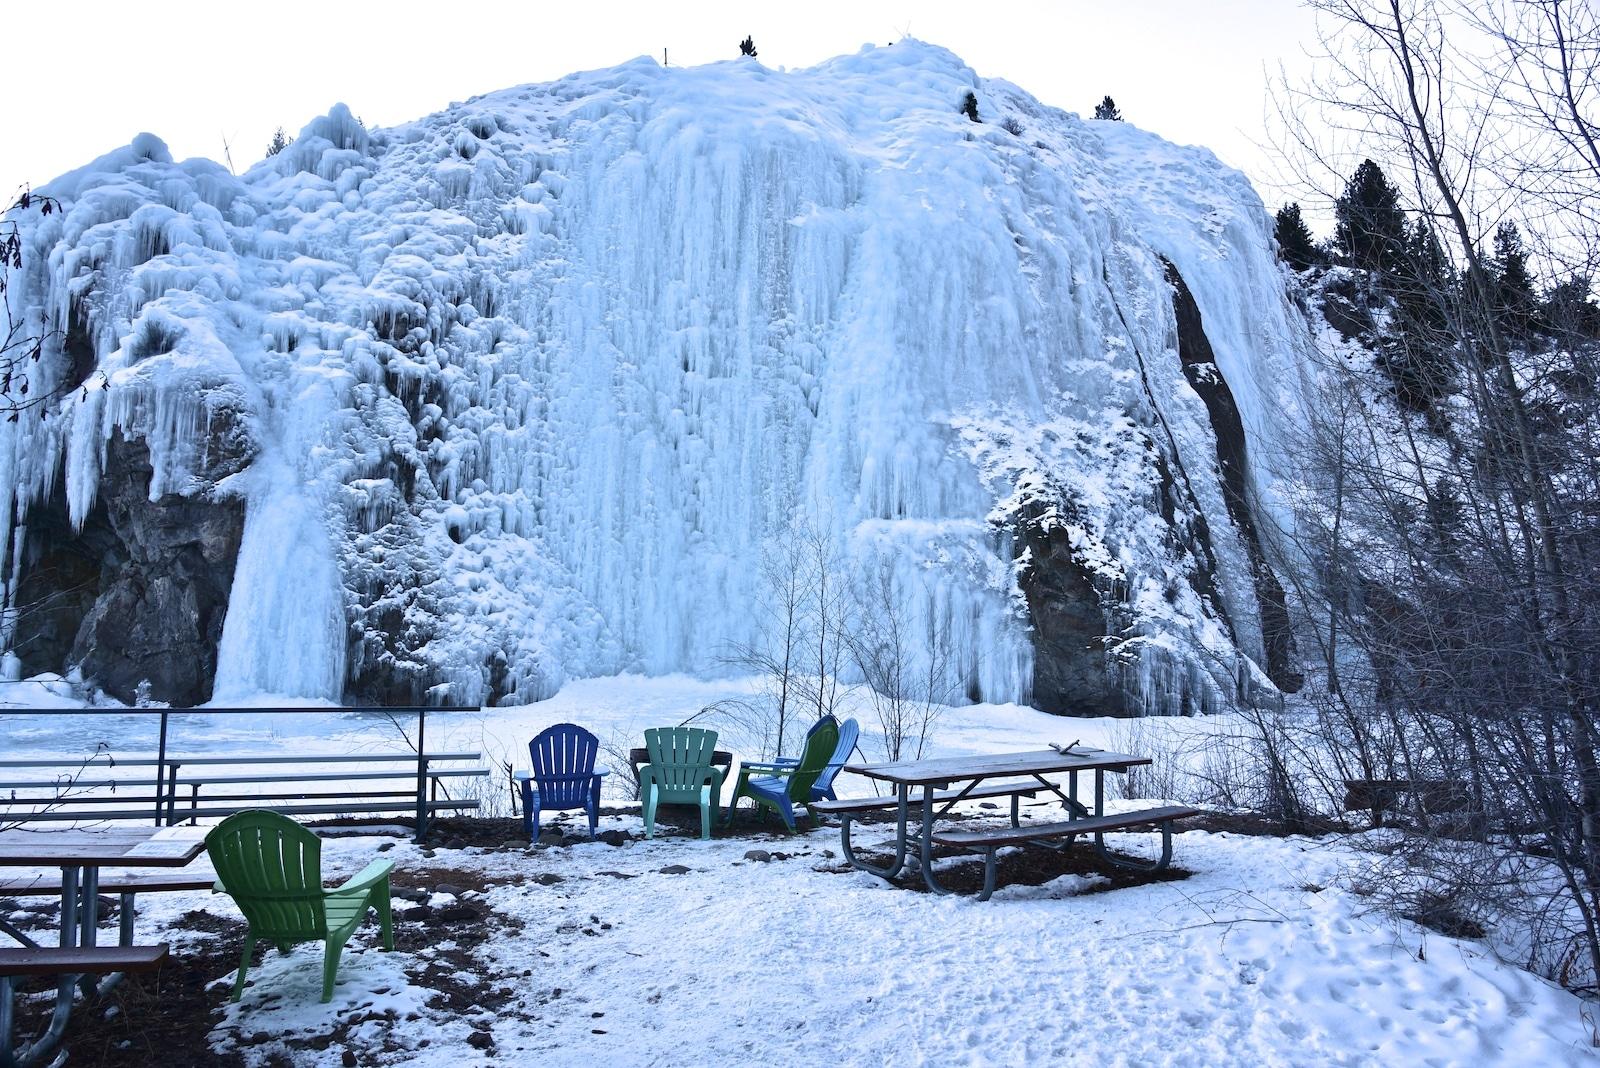 Lake City Ice Climbing Park, CO